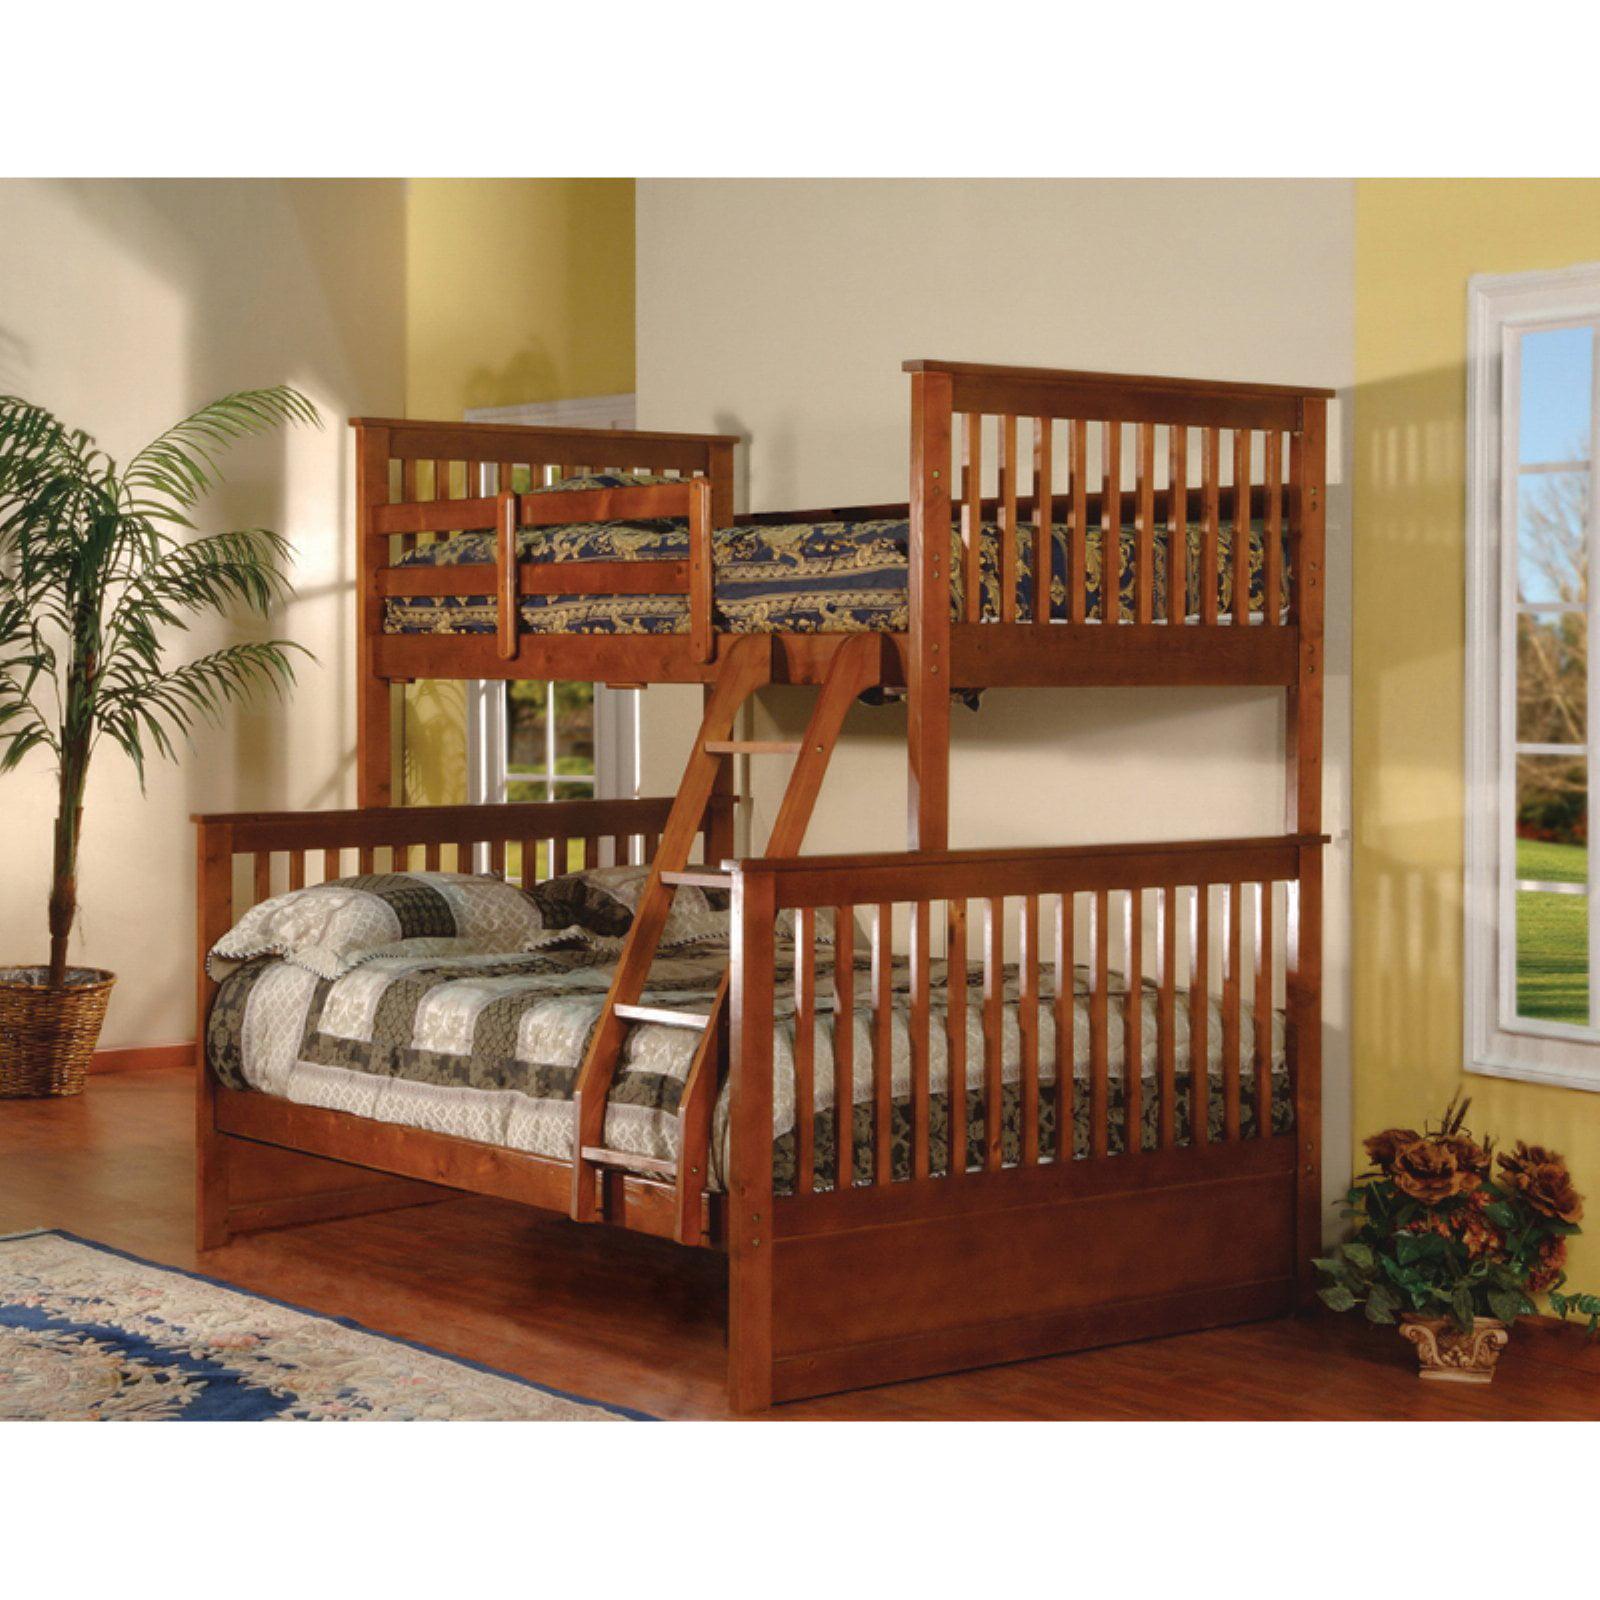 K & B Furniture Twin Over Full Bunk Bed Esprit Walnut by KB Furniture